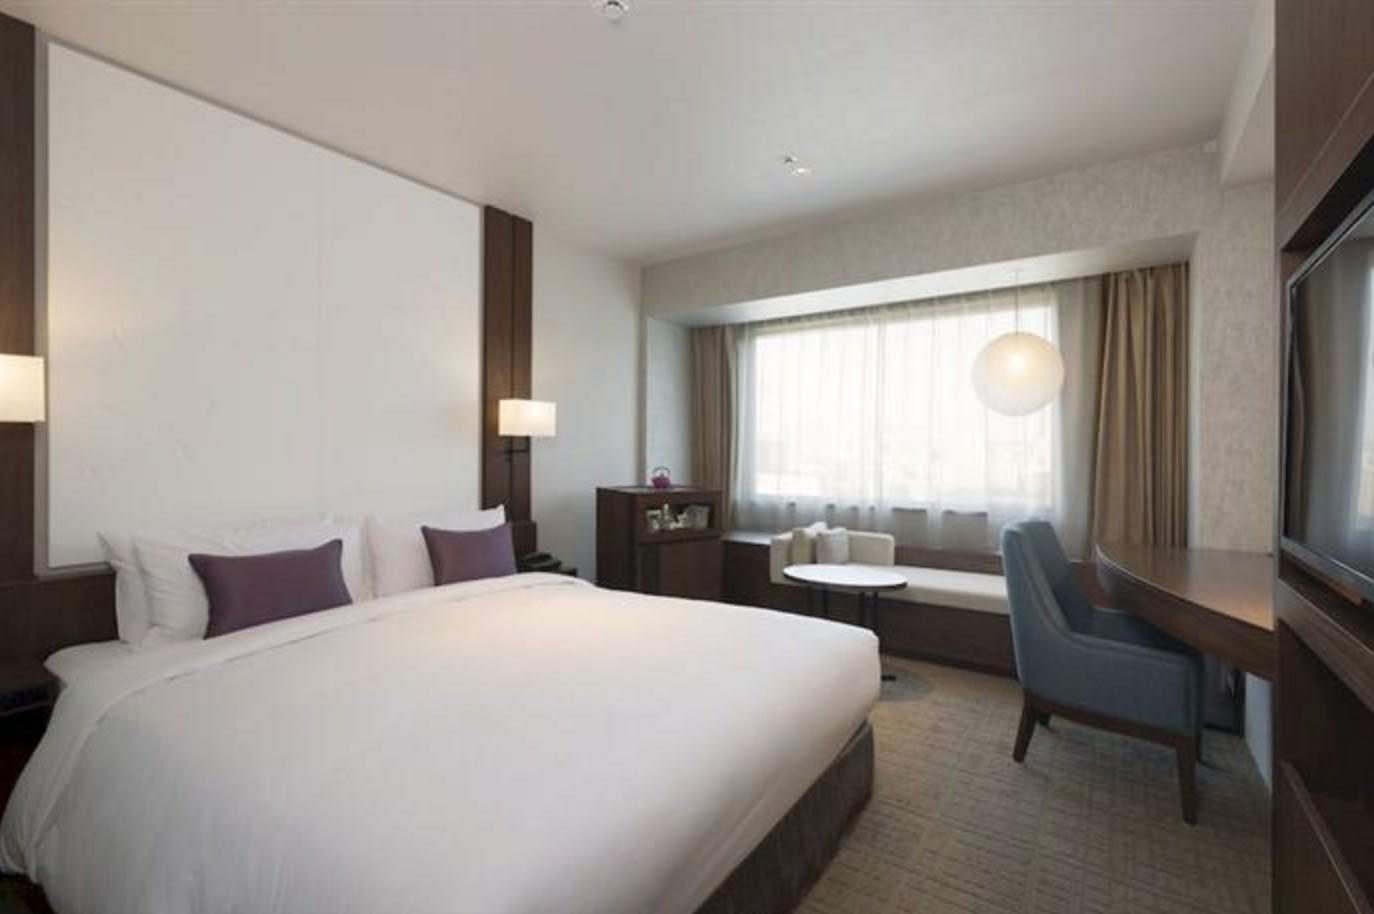 Keio Plaza Hotel Sapporo Master Room